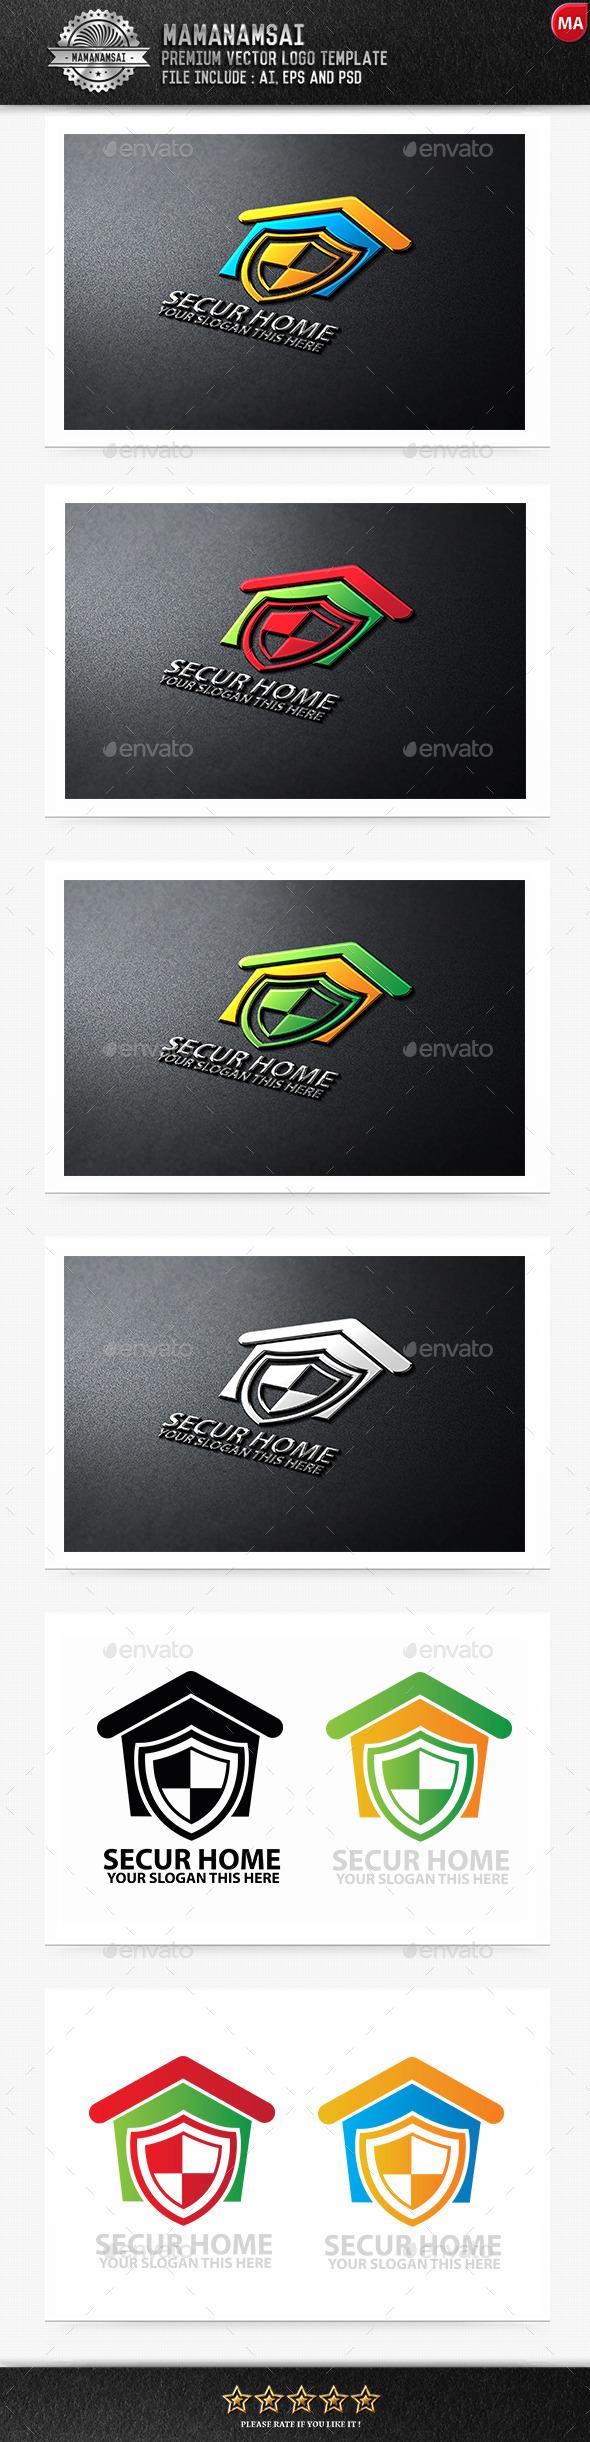 Secure Home Logo - Logo Templates